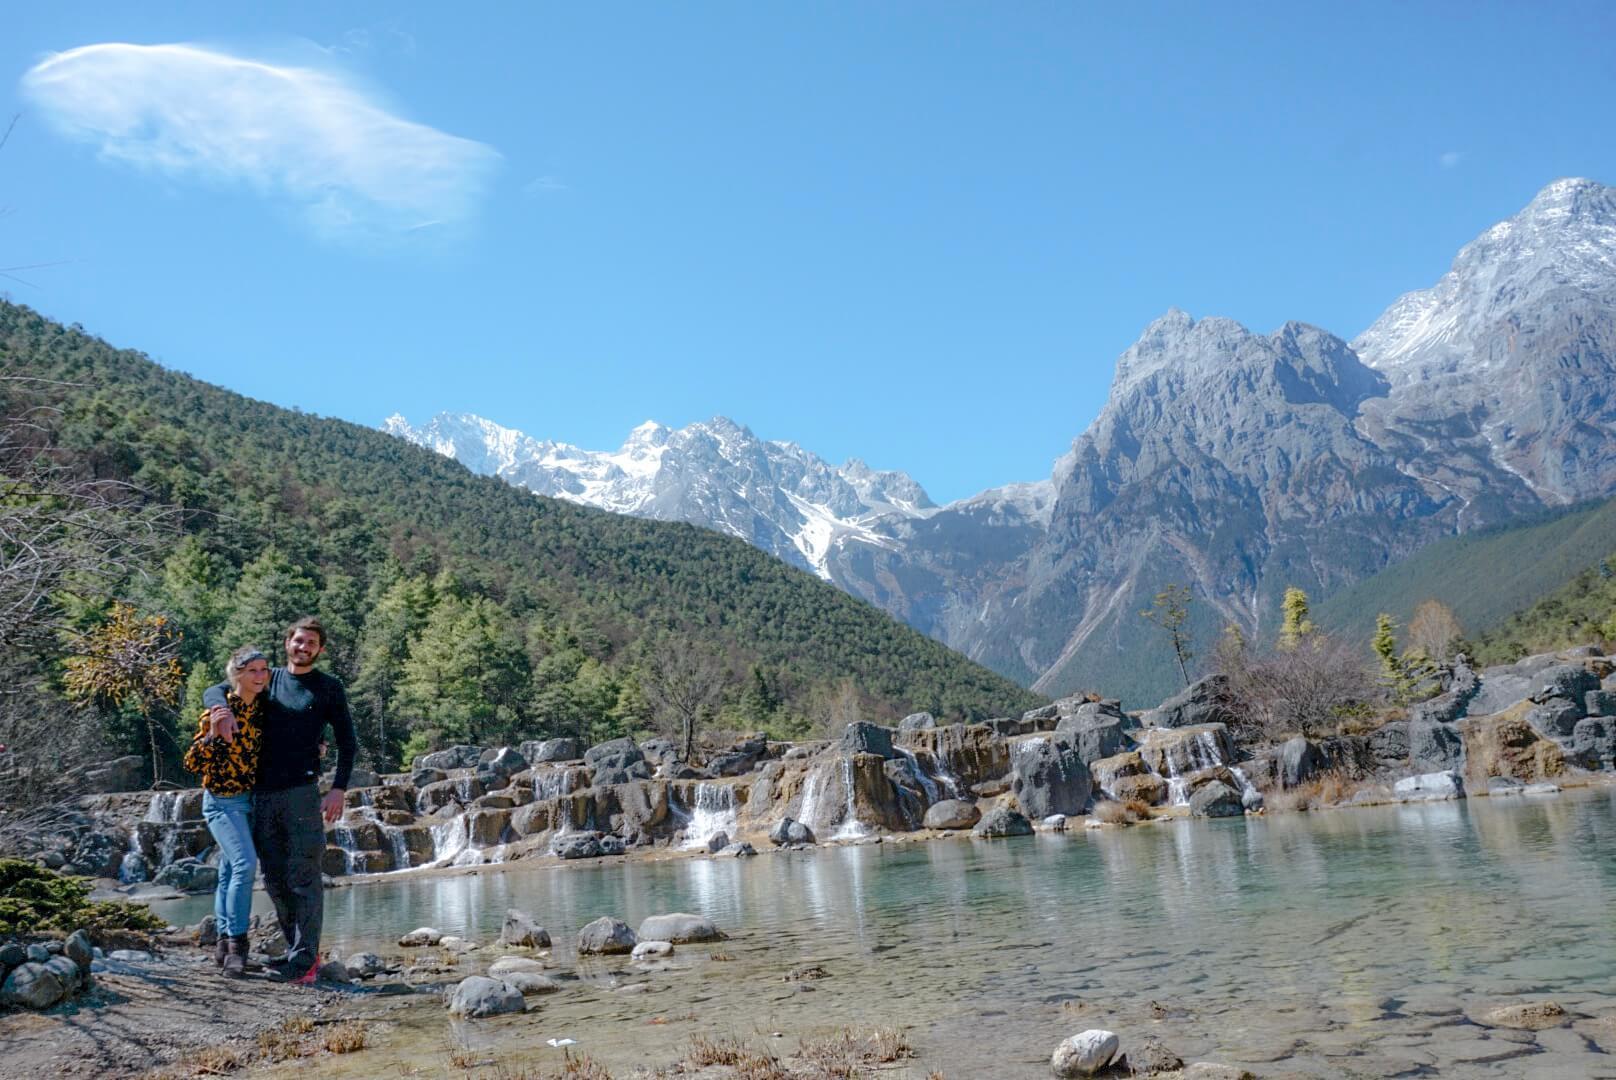 la blue moon valley parc national un incontournable du Yunnan chine Lijiang